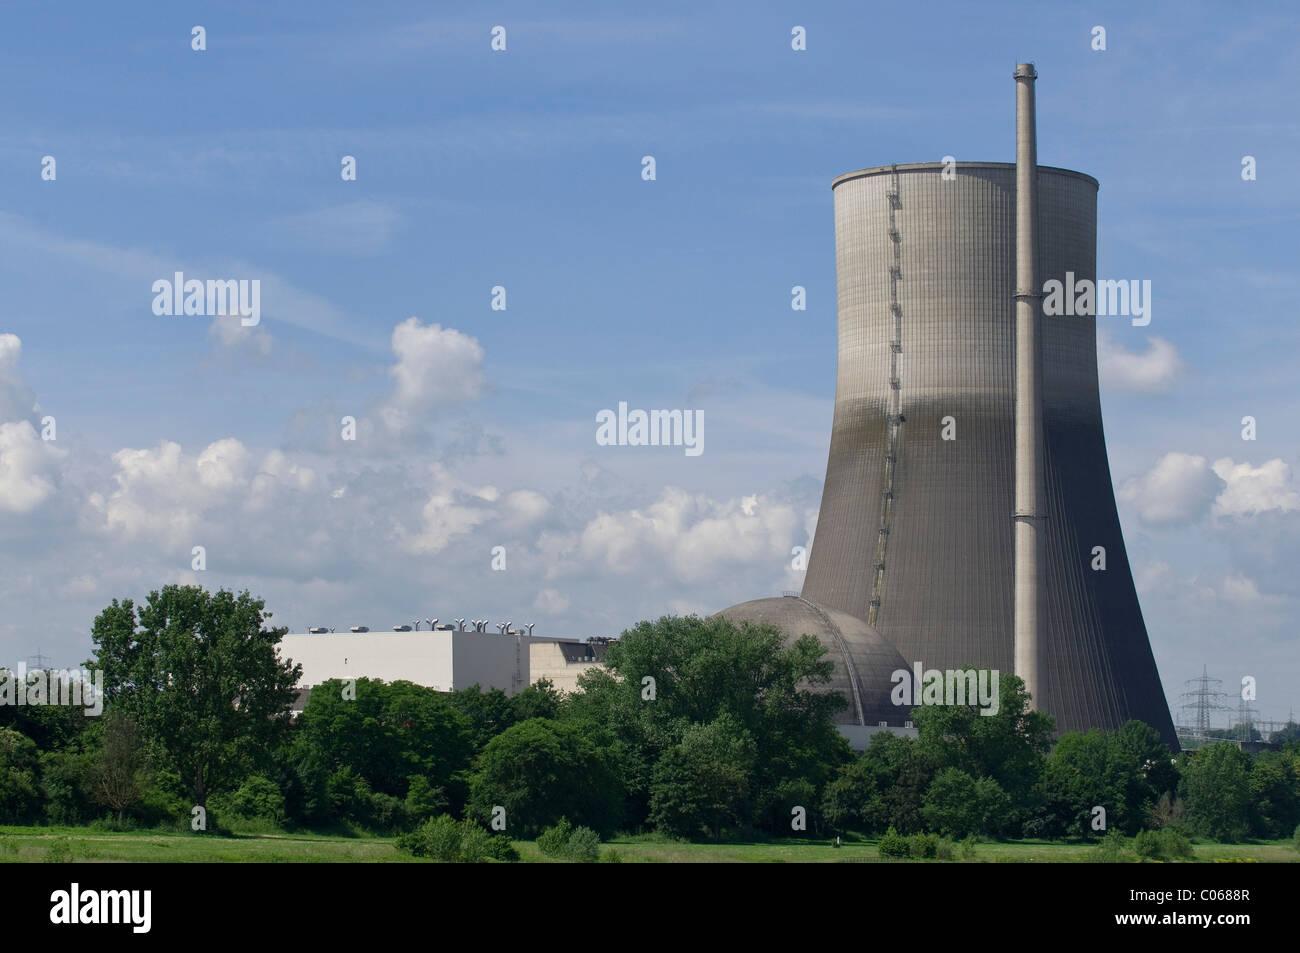 Nuclear power plant Muehlheim Kaerlich being dismantled, operator RWE Power AG, Rhineland-Palatinate, Germany, Europe - Stock Image